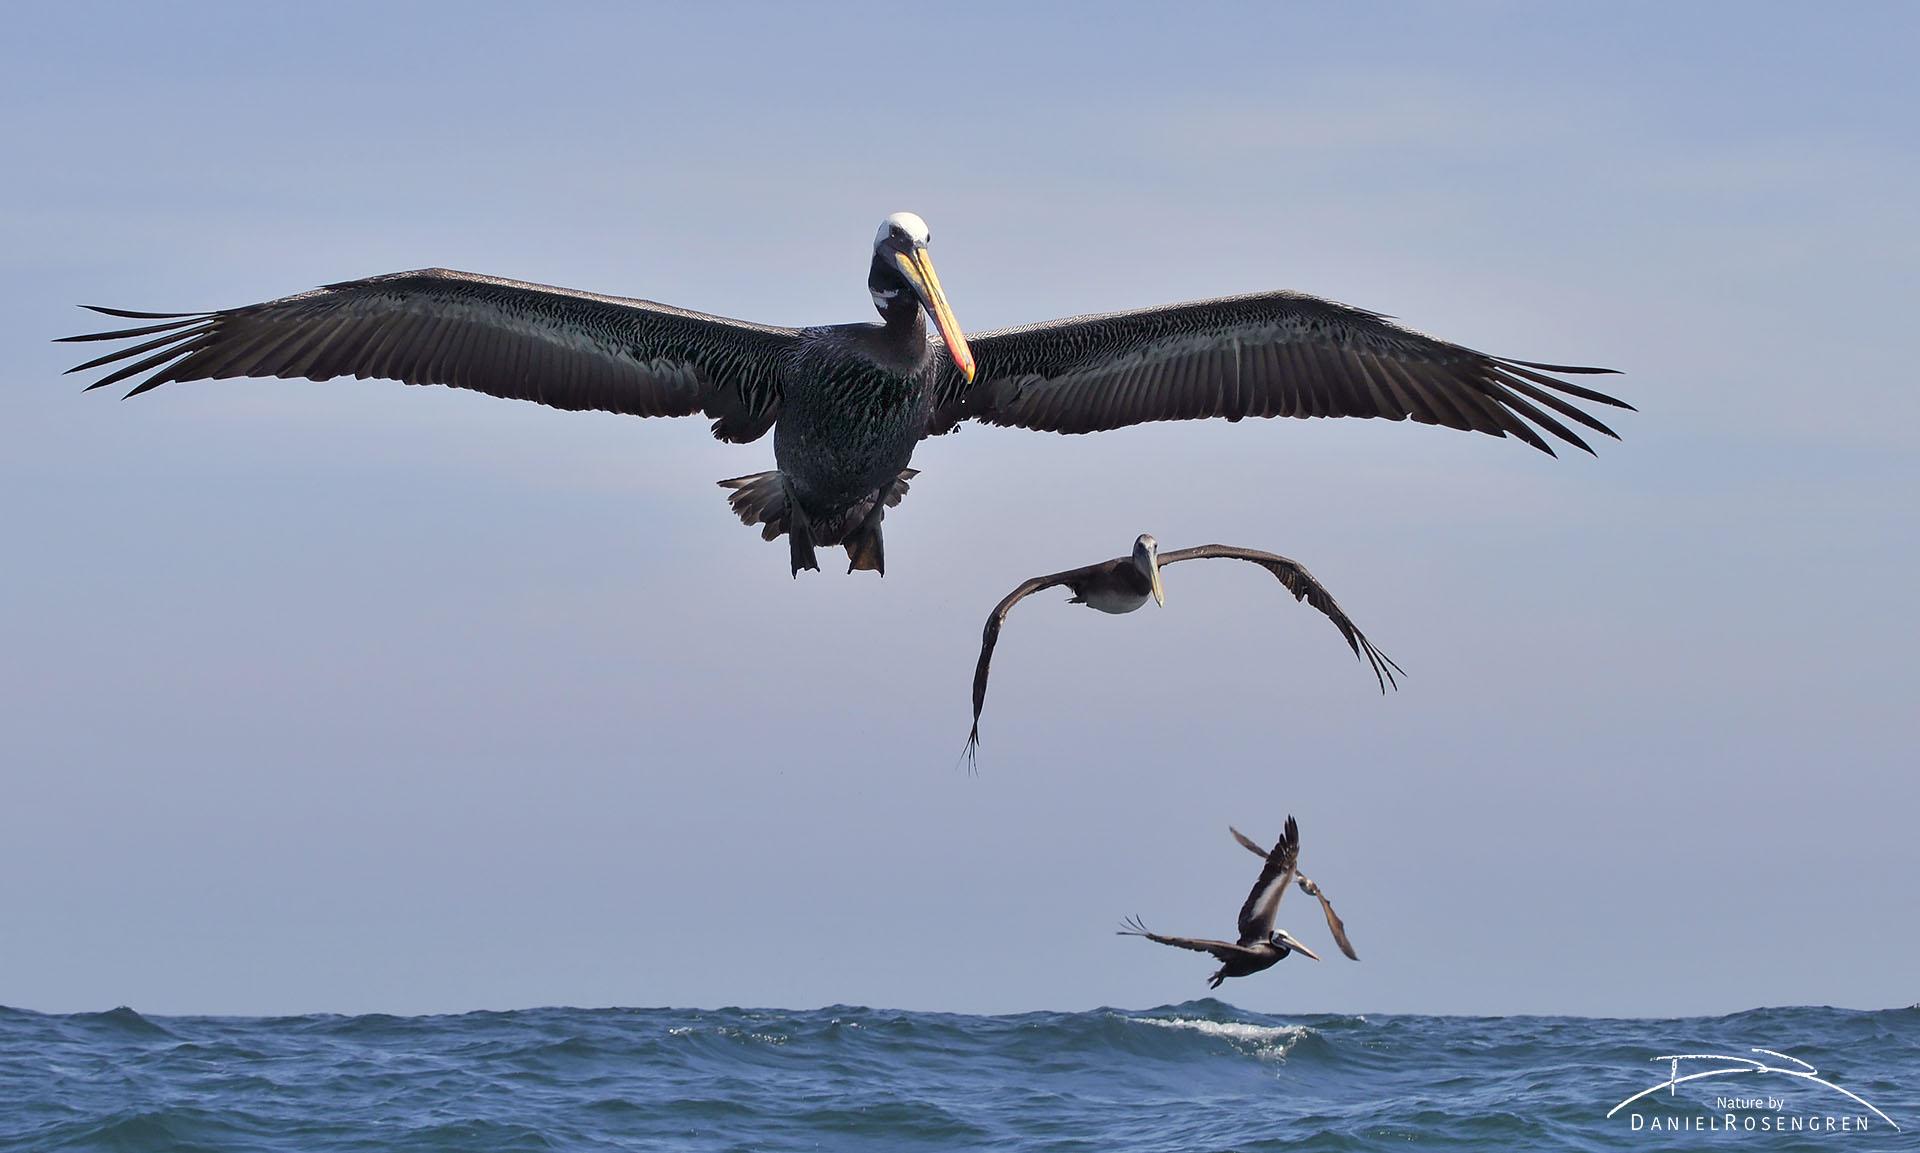 Peruvian pelicans arriving at the feeding frenzy. © Daniel Rosengren